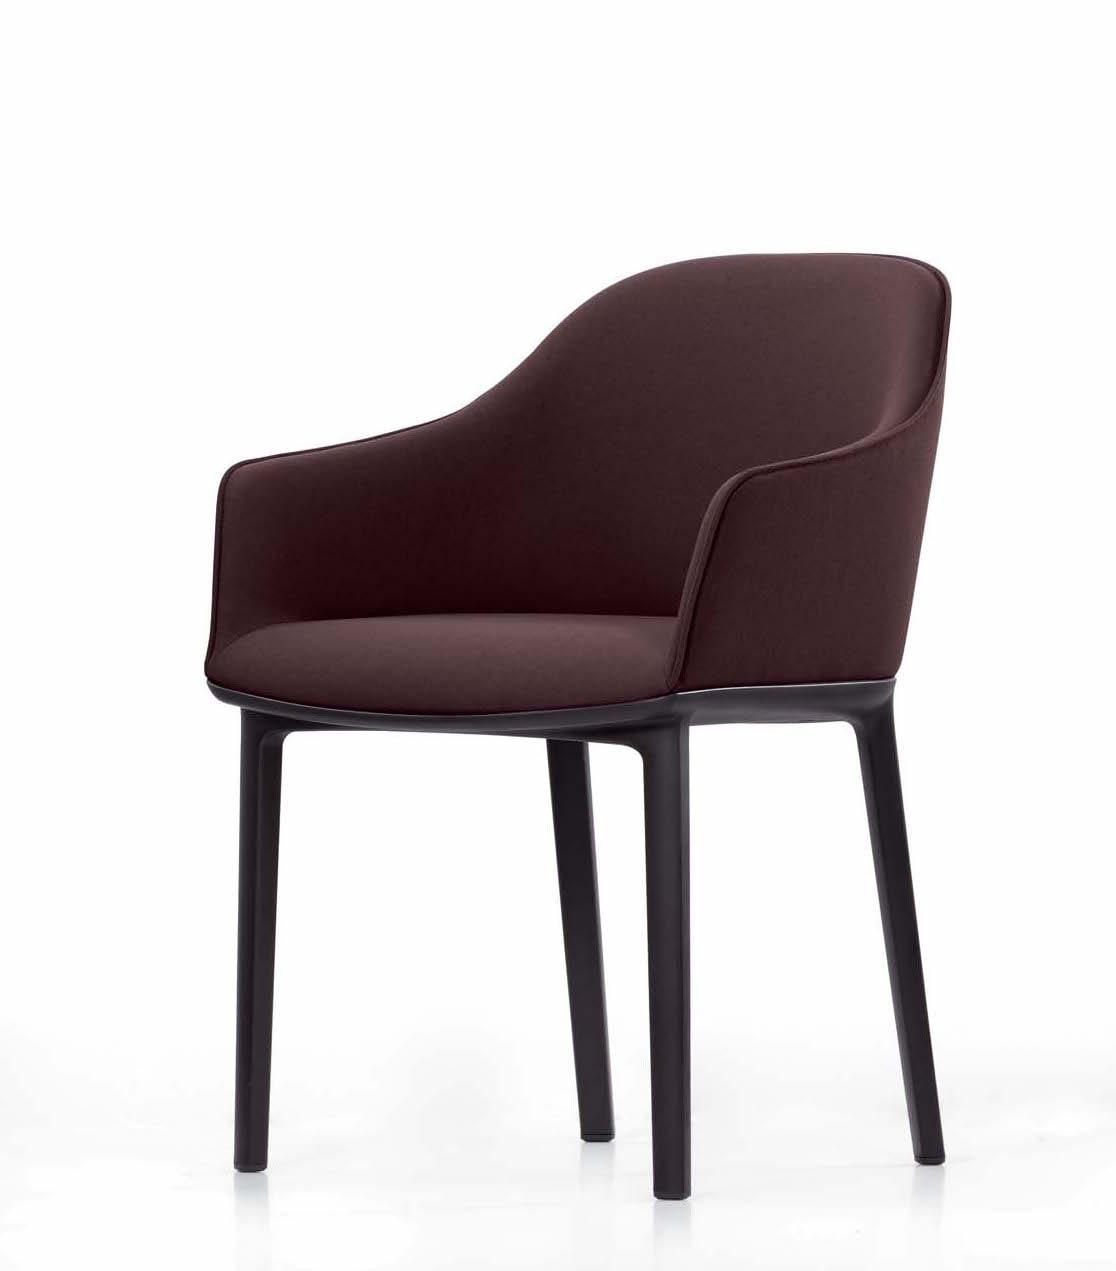 Shoftshell Chair von Vitra